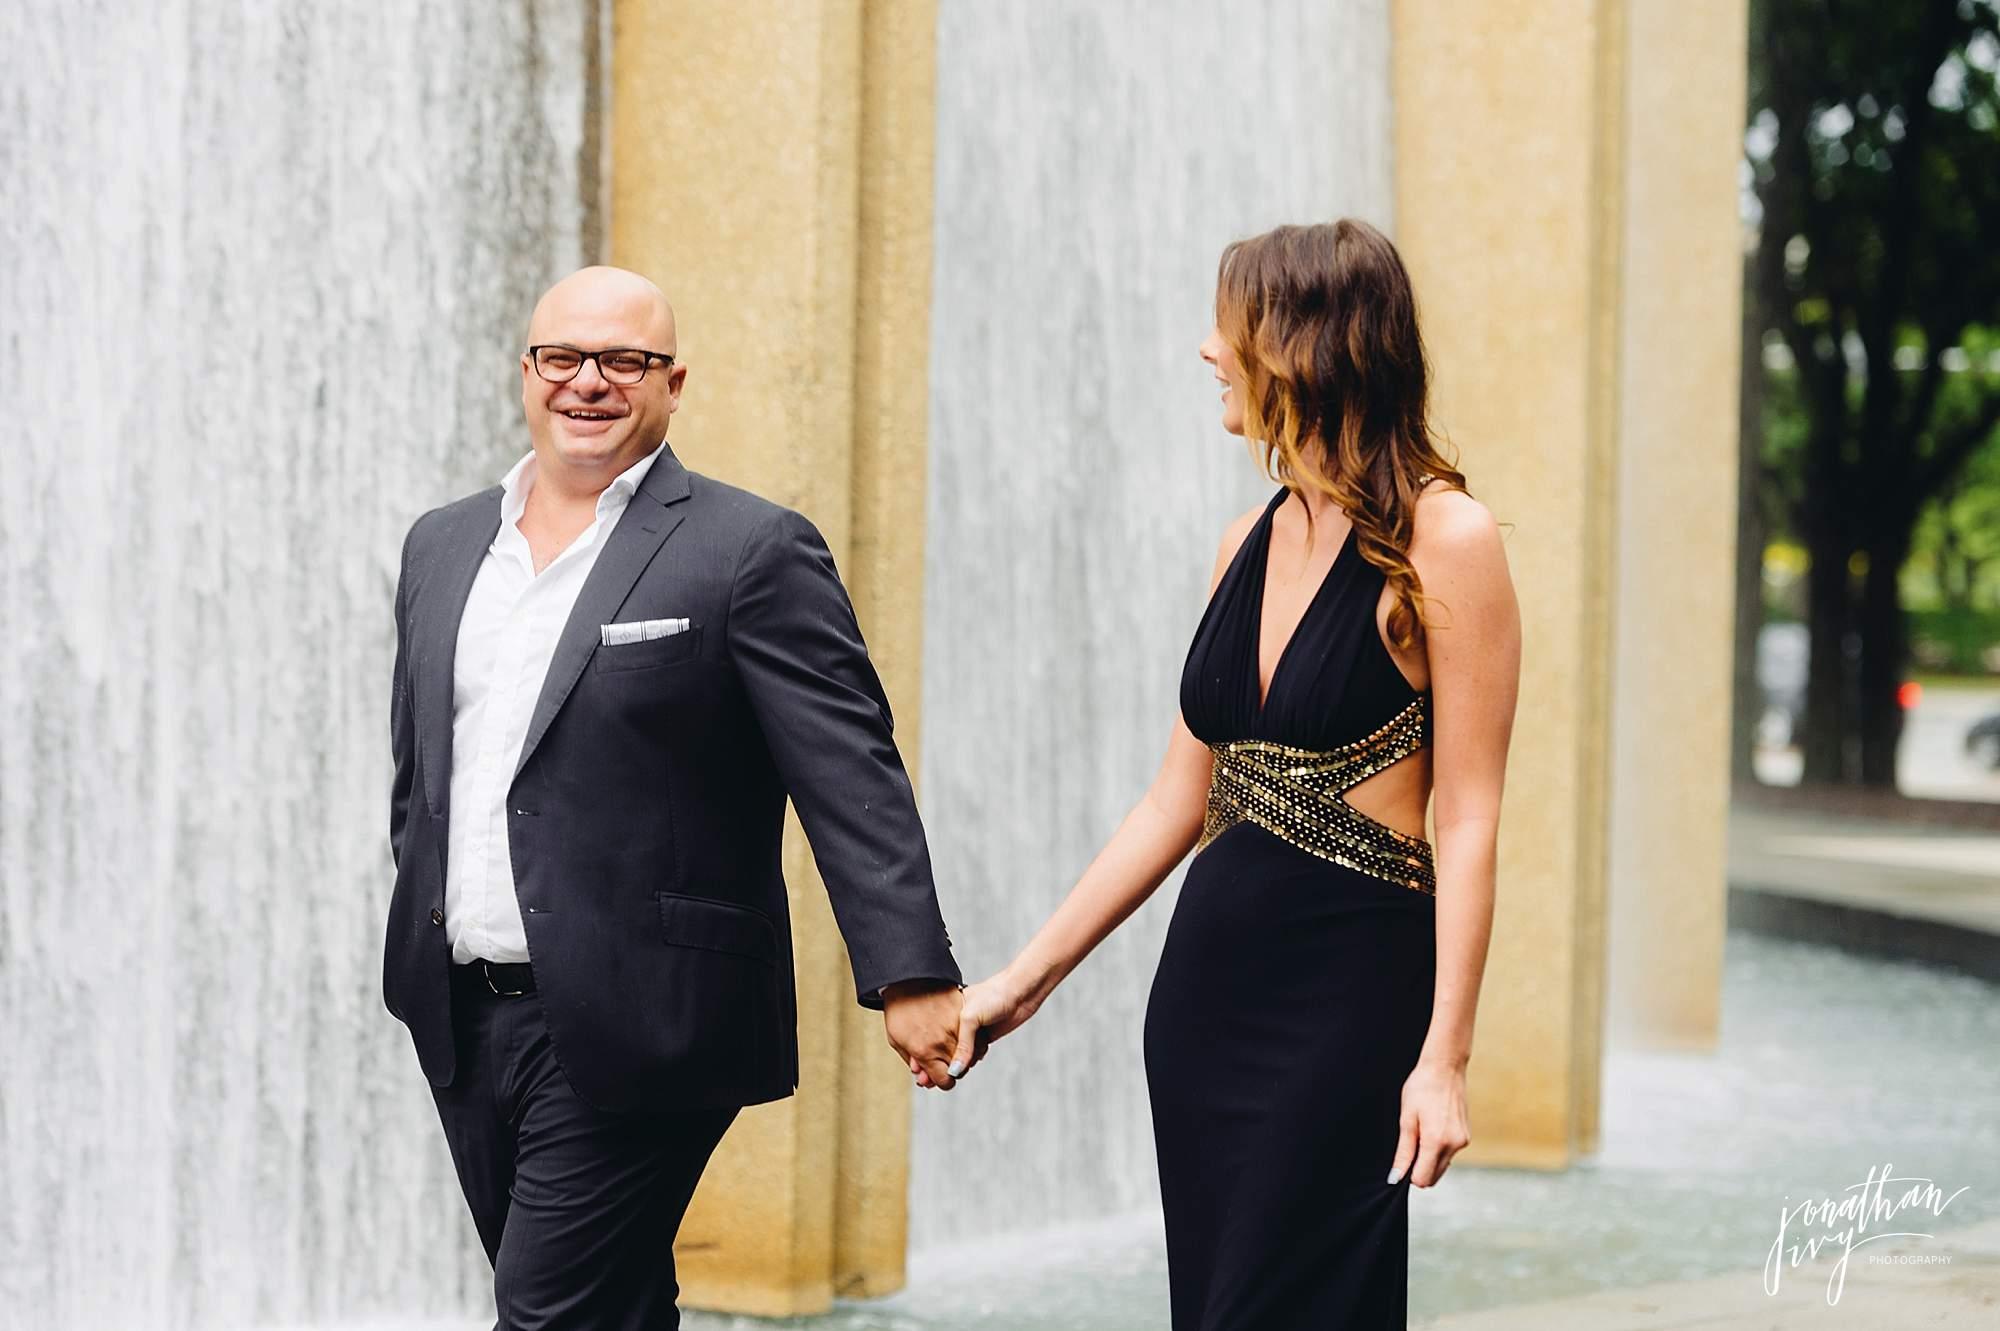 Romantic-Engagement-Photos-Houston_0001.jpg